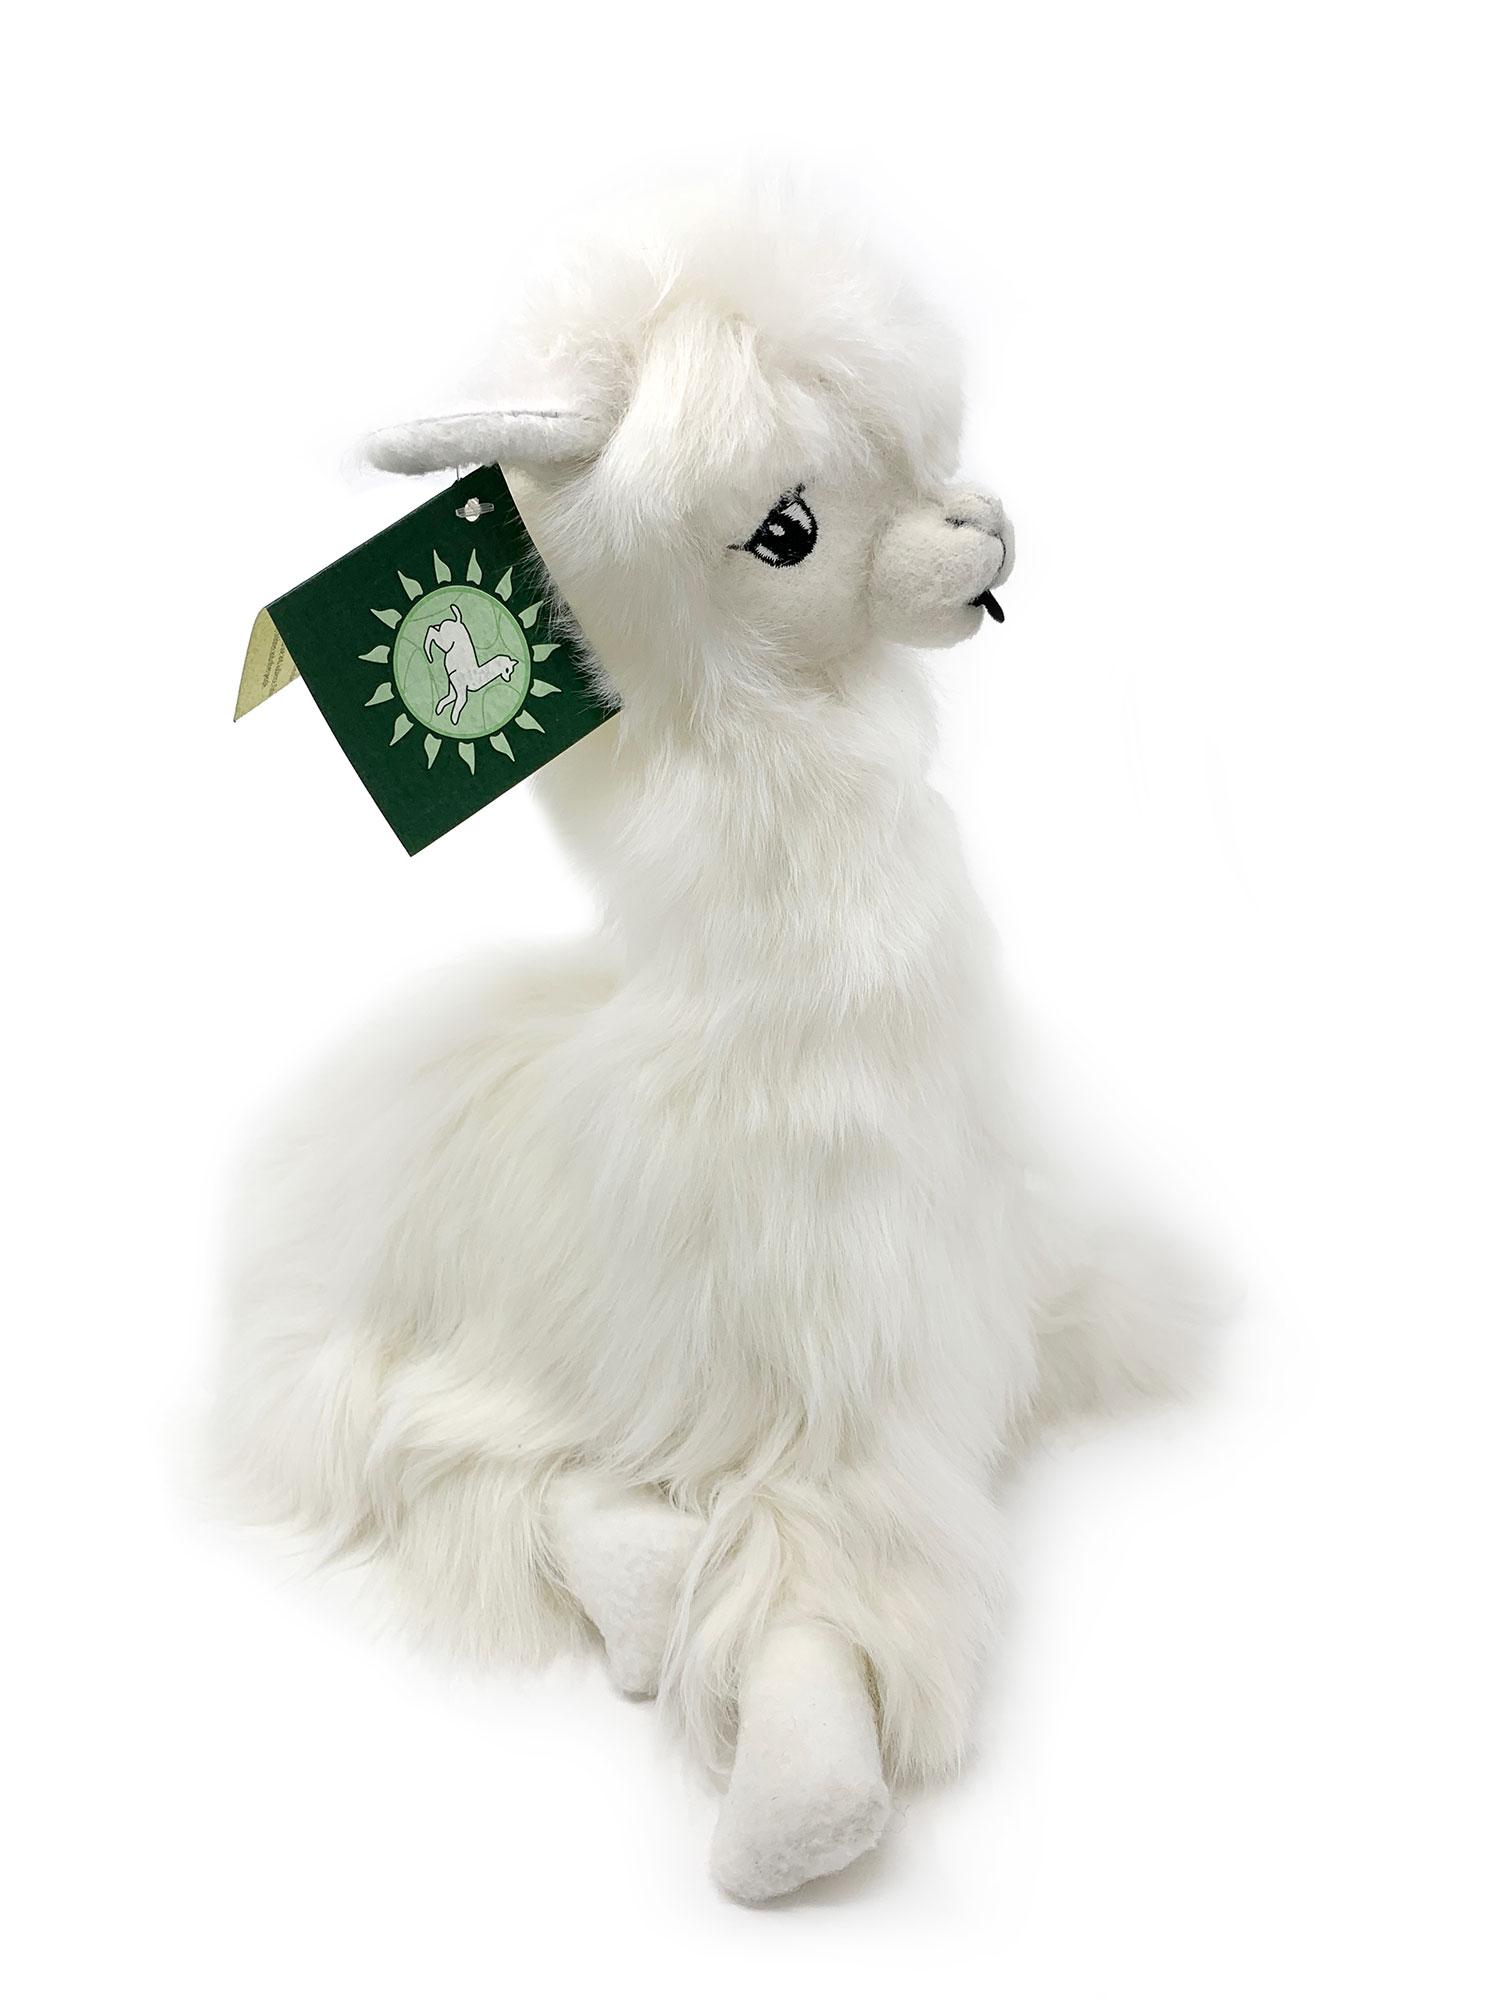 12 inch Sitting Suri Alpaca Plush Toy White